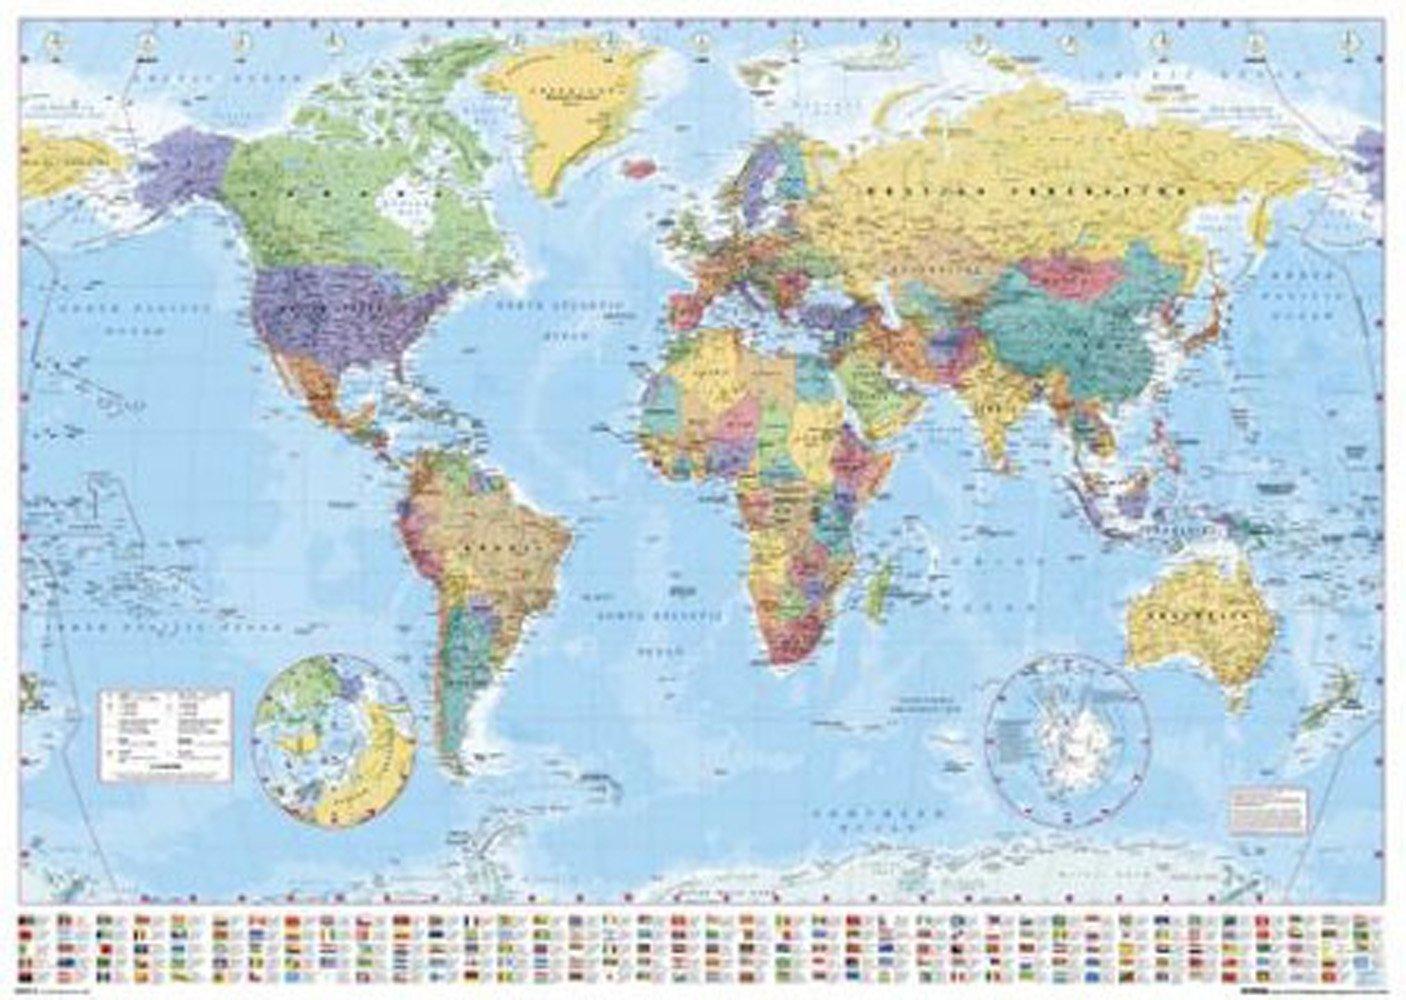 Cartina Geografica Mondo Gratis.Il Mondo Scala 1 28 500 000 Ediz Plastificata Ca 100x144